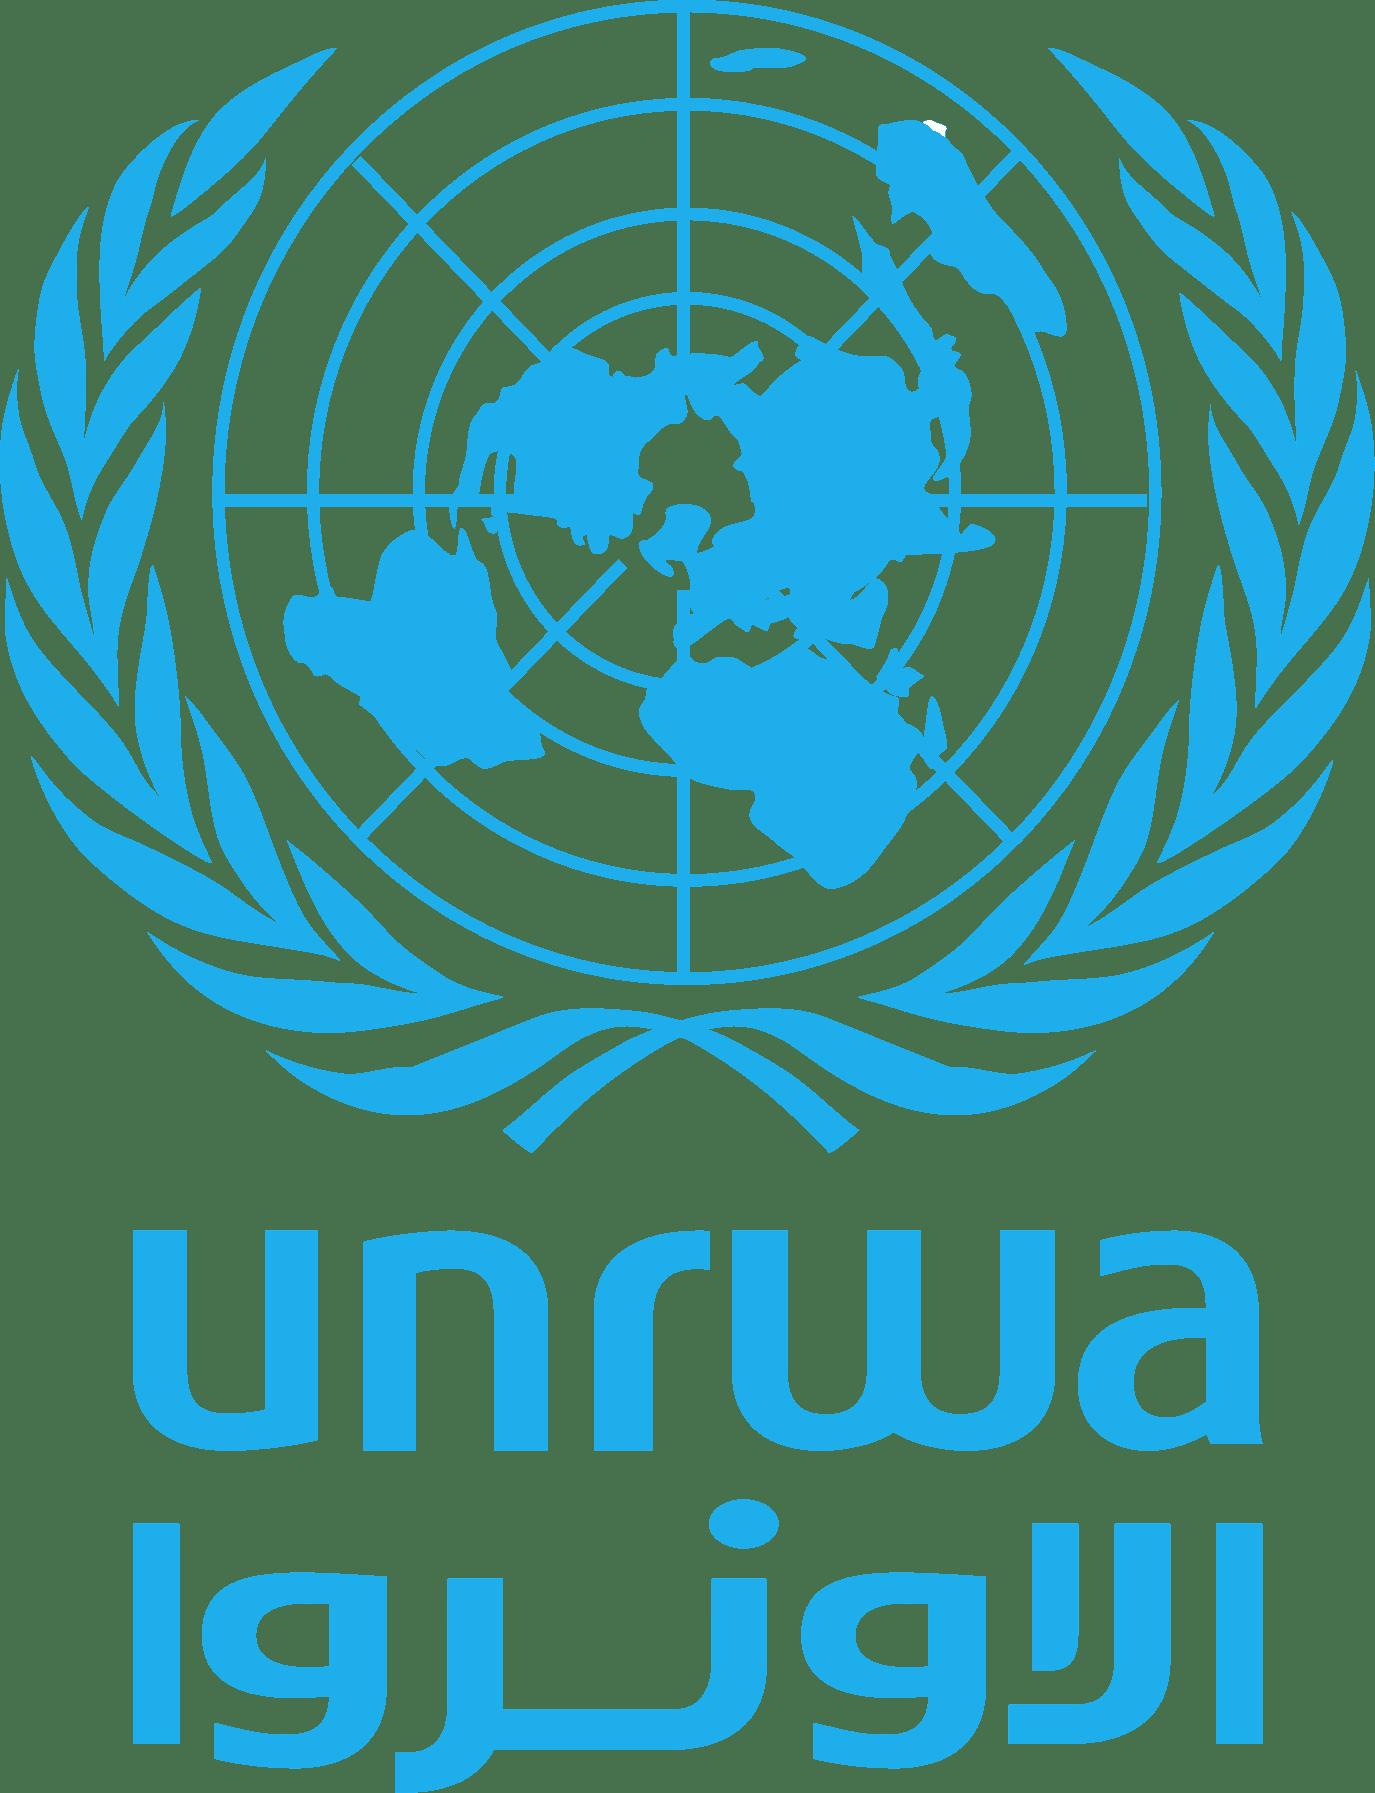 united nations refugee agency